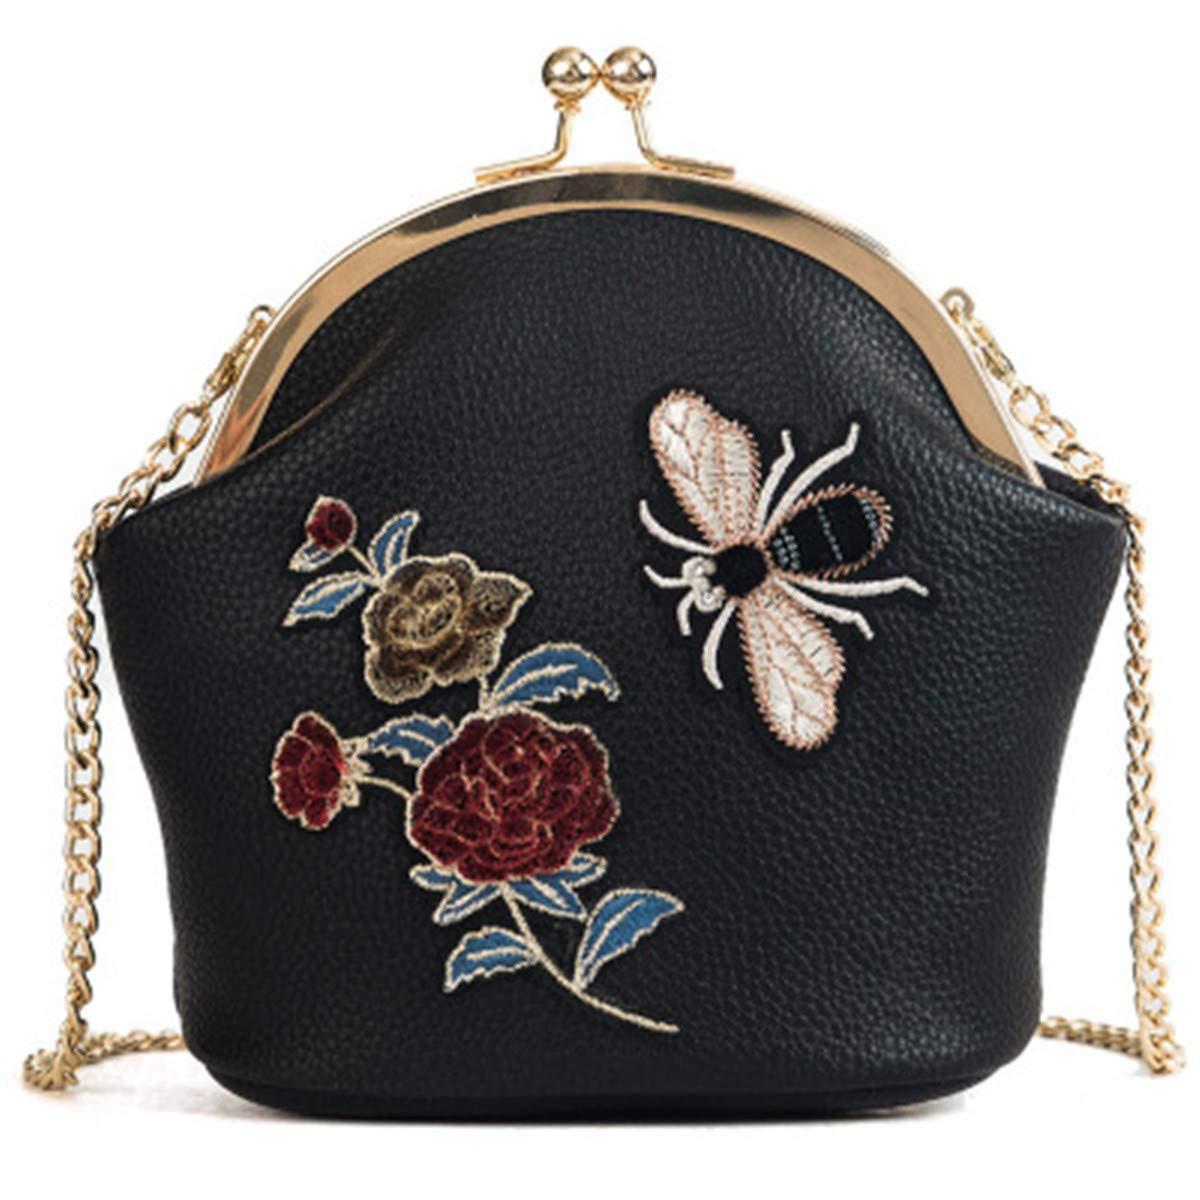 Get Quotations · BeautyWJY Women s Vintage Flower Evening Clutch Bags  Wedding Purse Party Handbags 7c0007b38f64